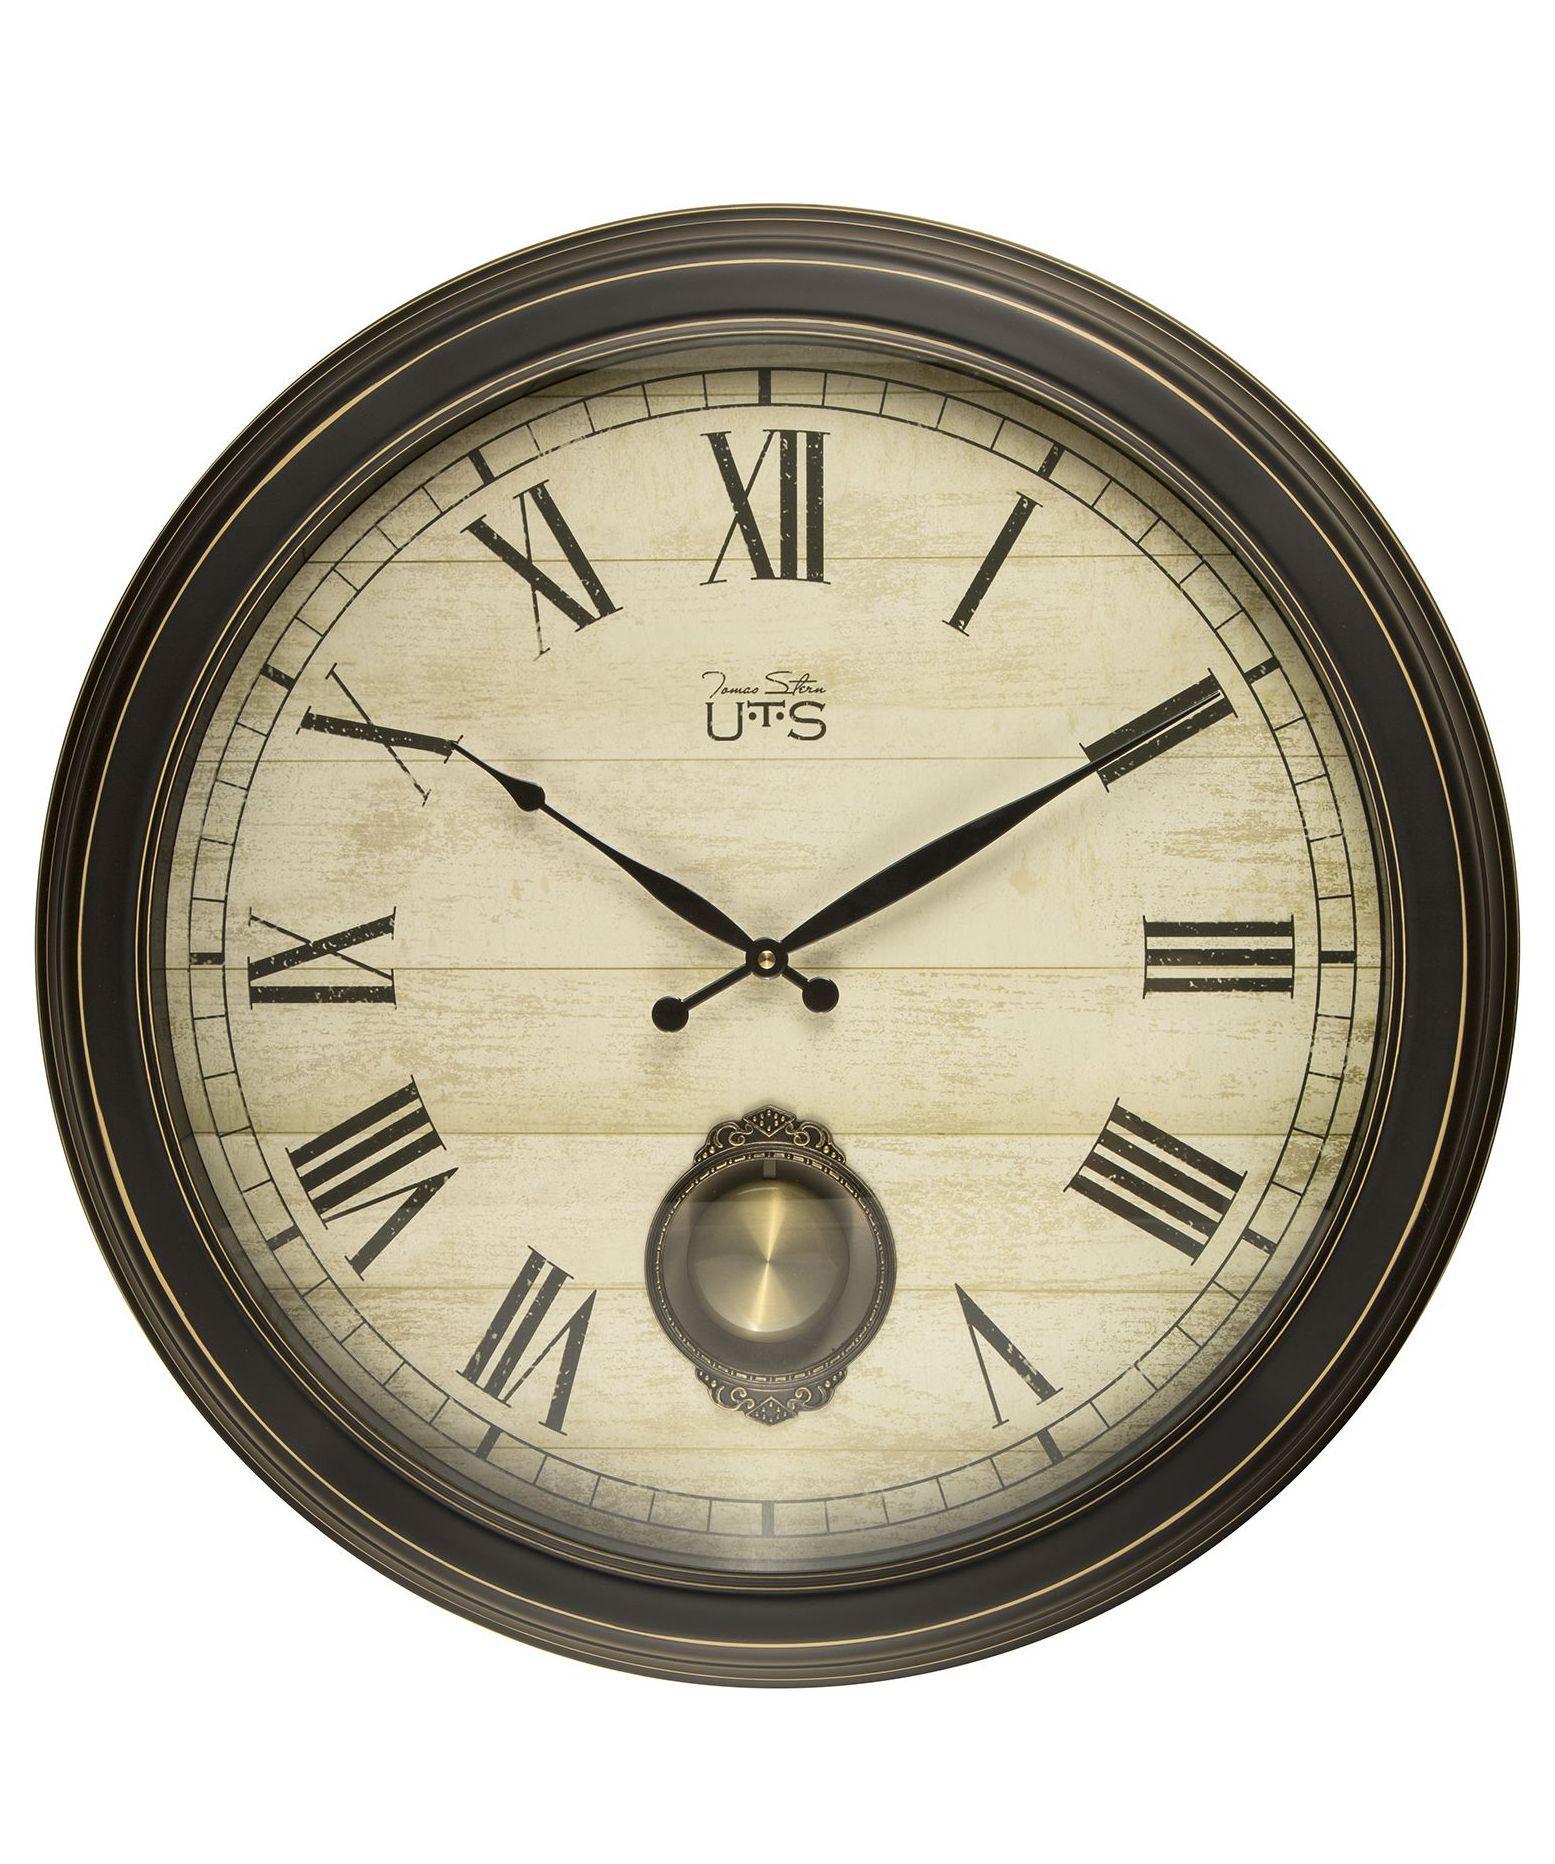 Часы настенные Часы настенные Tomas Stern 9004 chasy-nastennye-tomas-stern-9004-germaniya.jpg